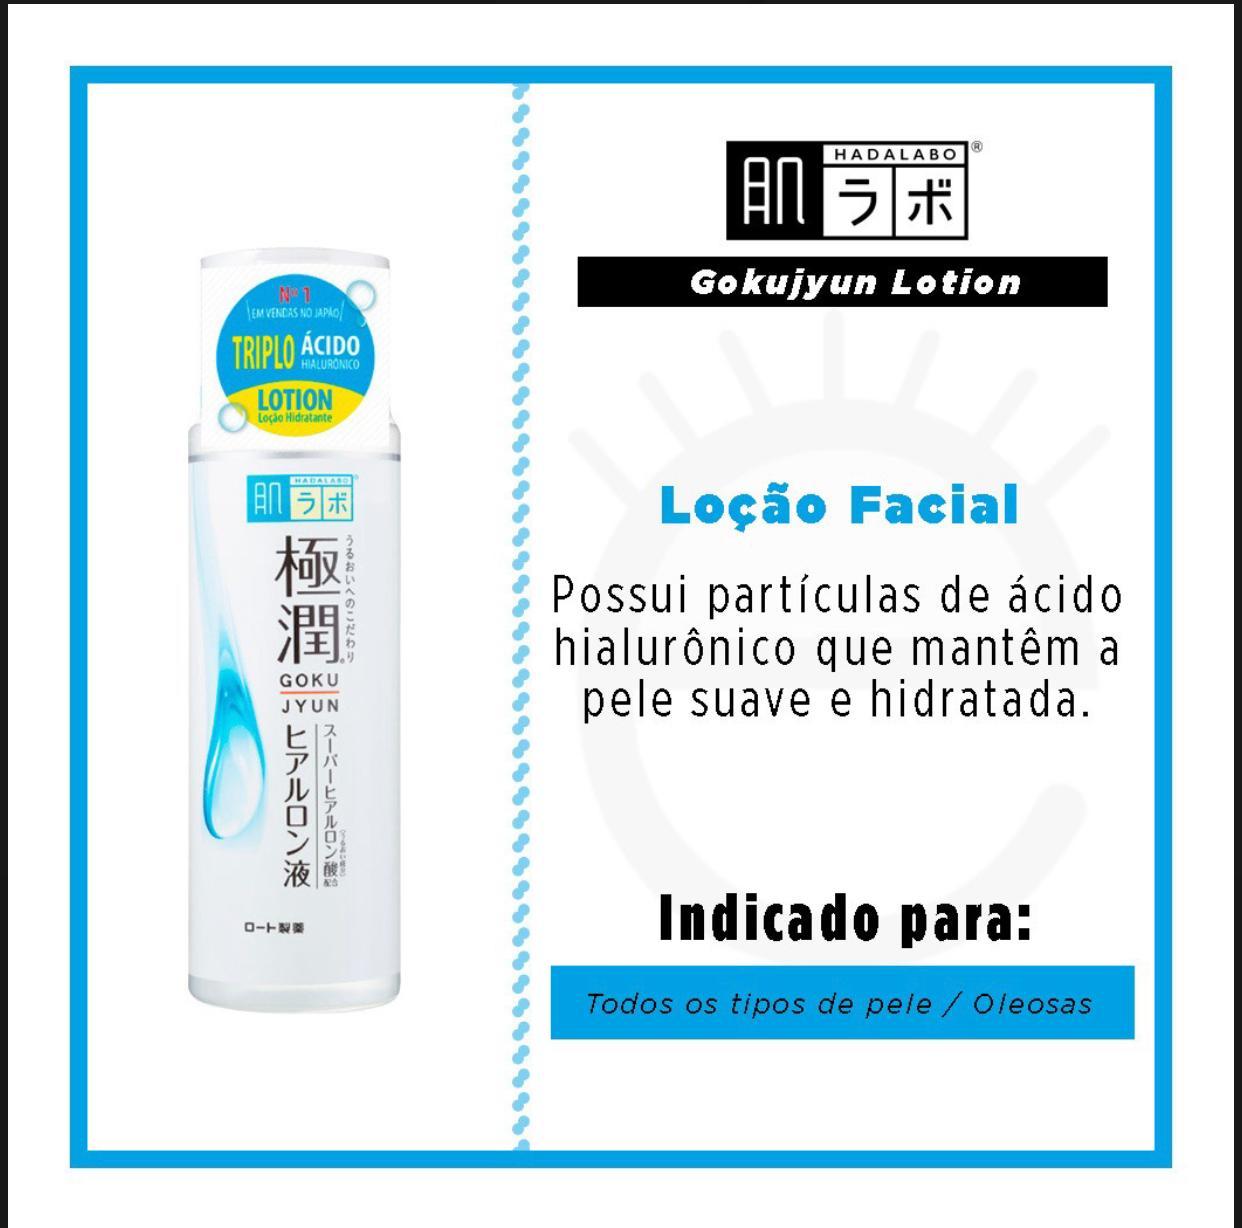 Loção Facial Hada Labo - Gokujyun (170ml)